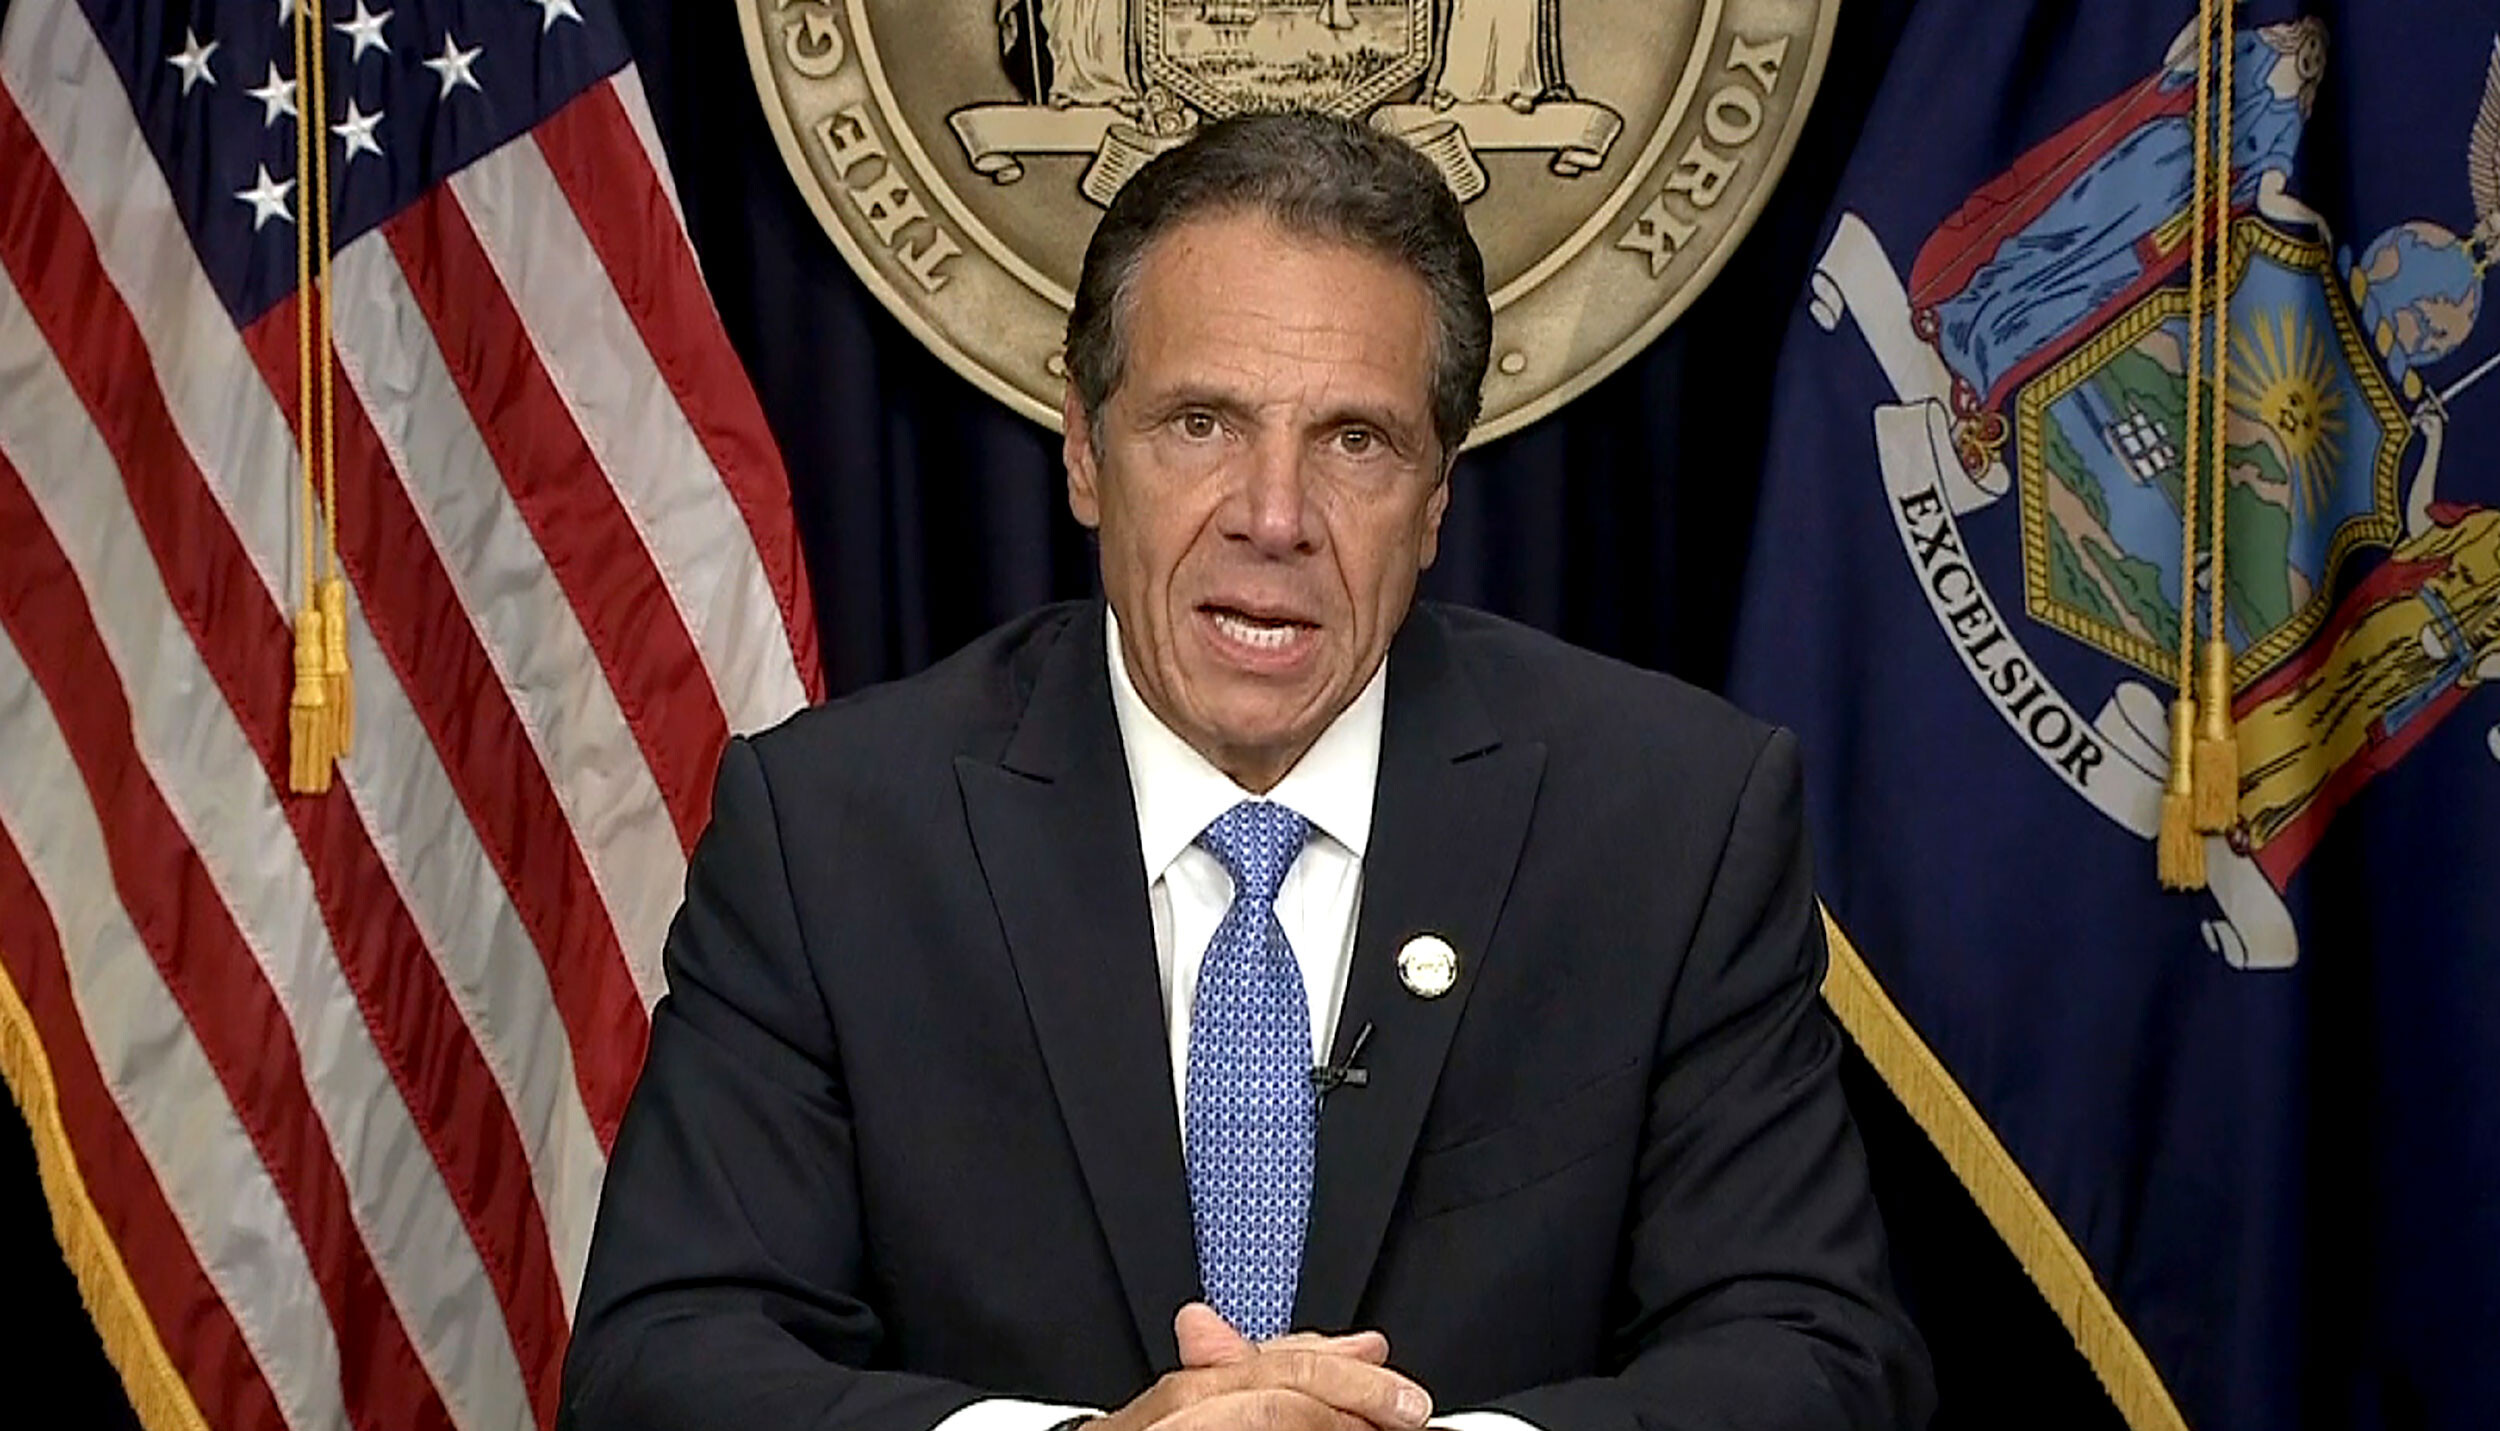 New York Gov. Andrew Cuomo will resign